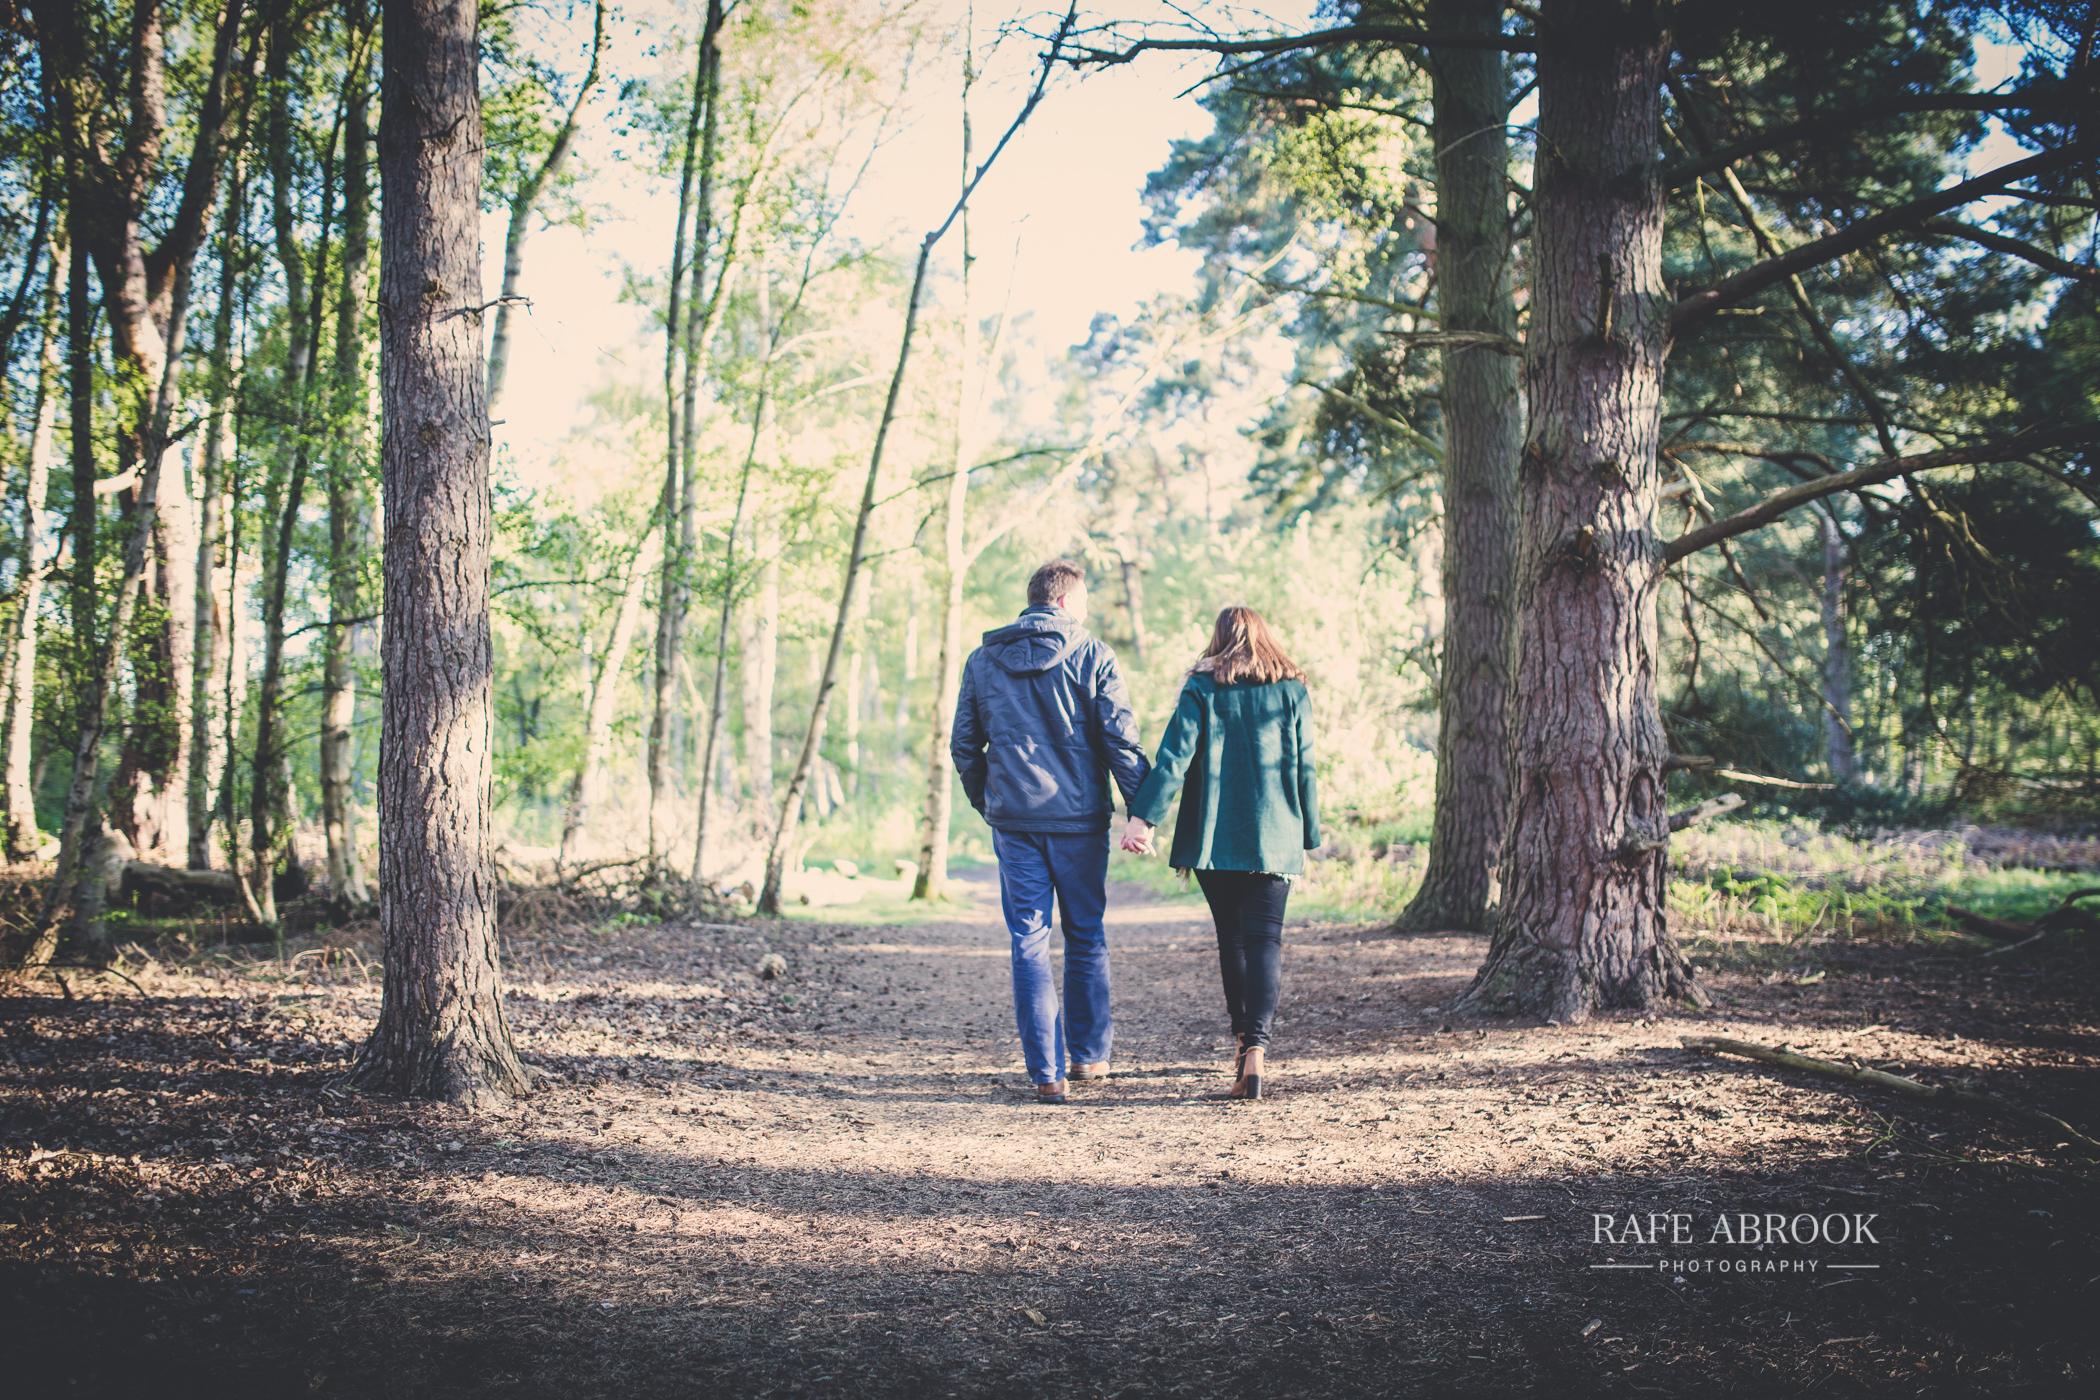 jon & laura engagement shoot rspb the lodge sandy bedfordshire-1010.jpg